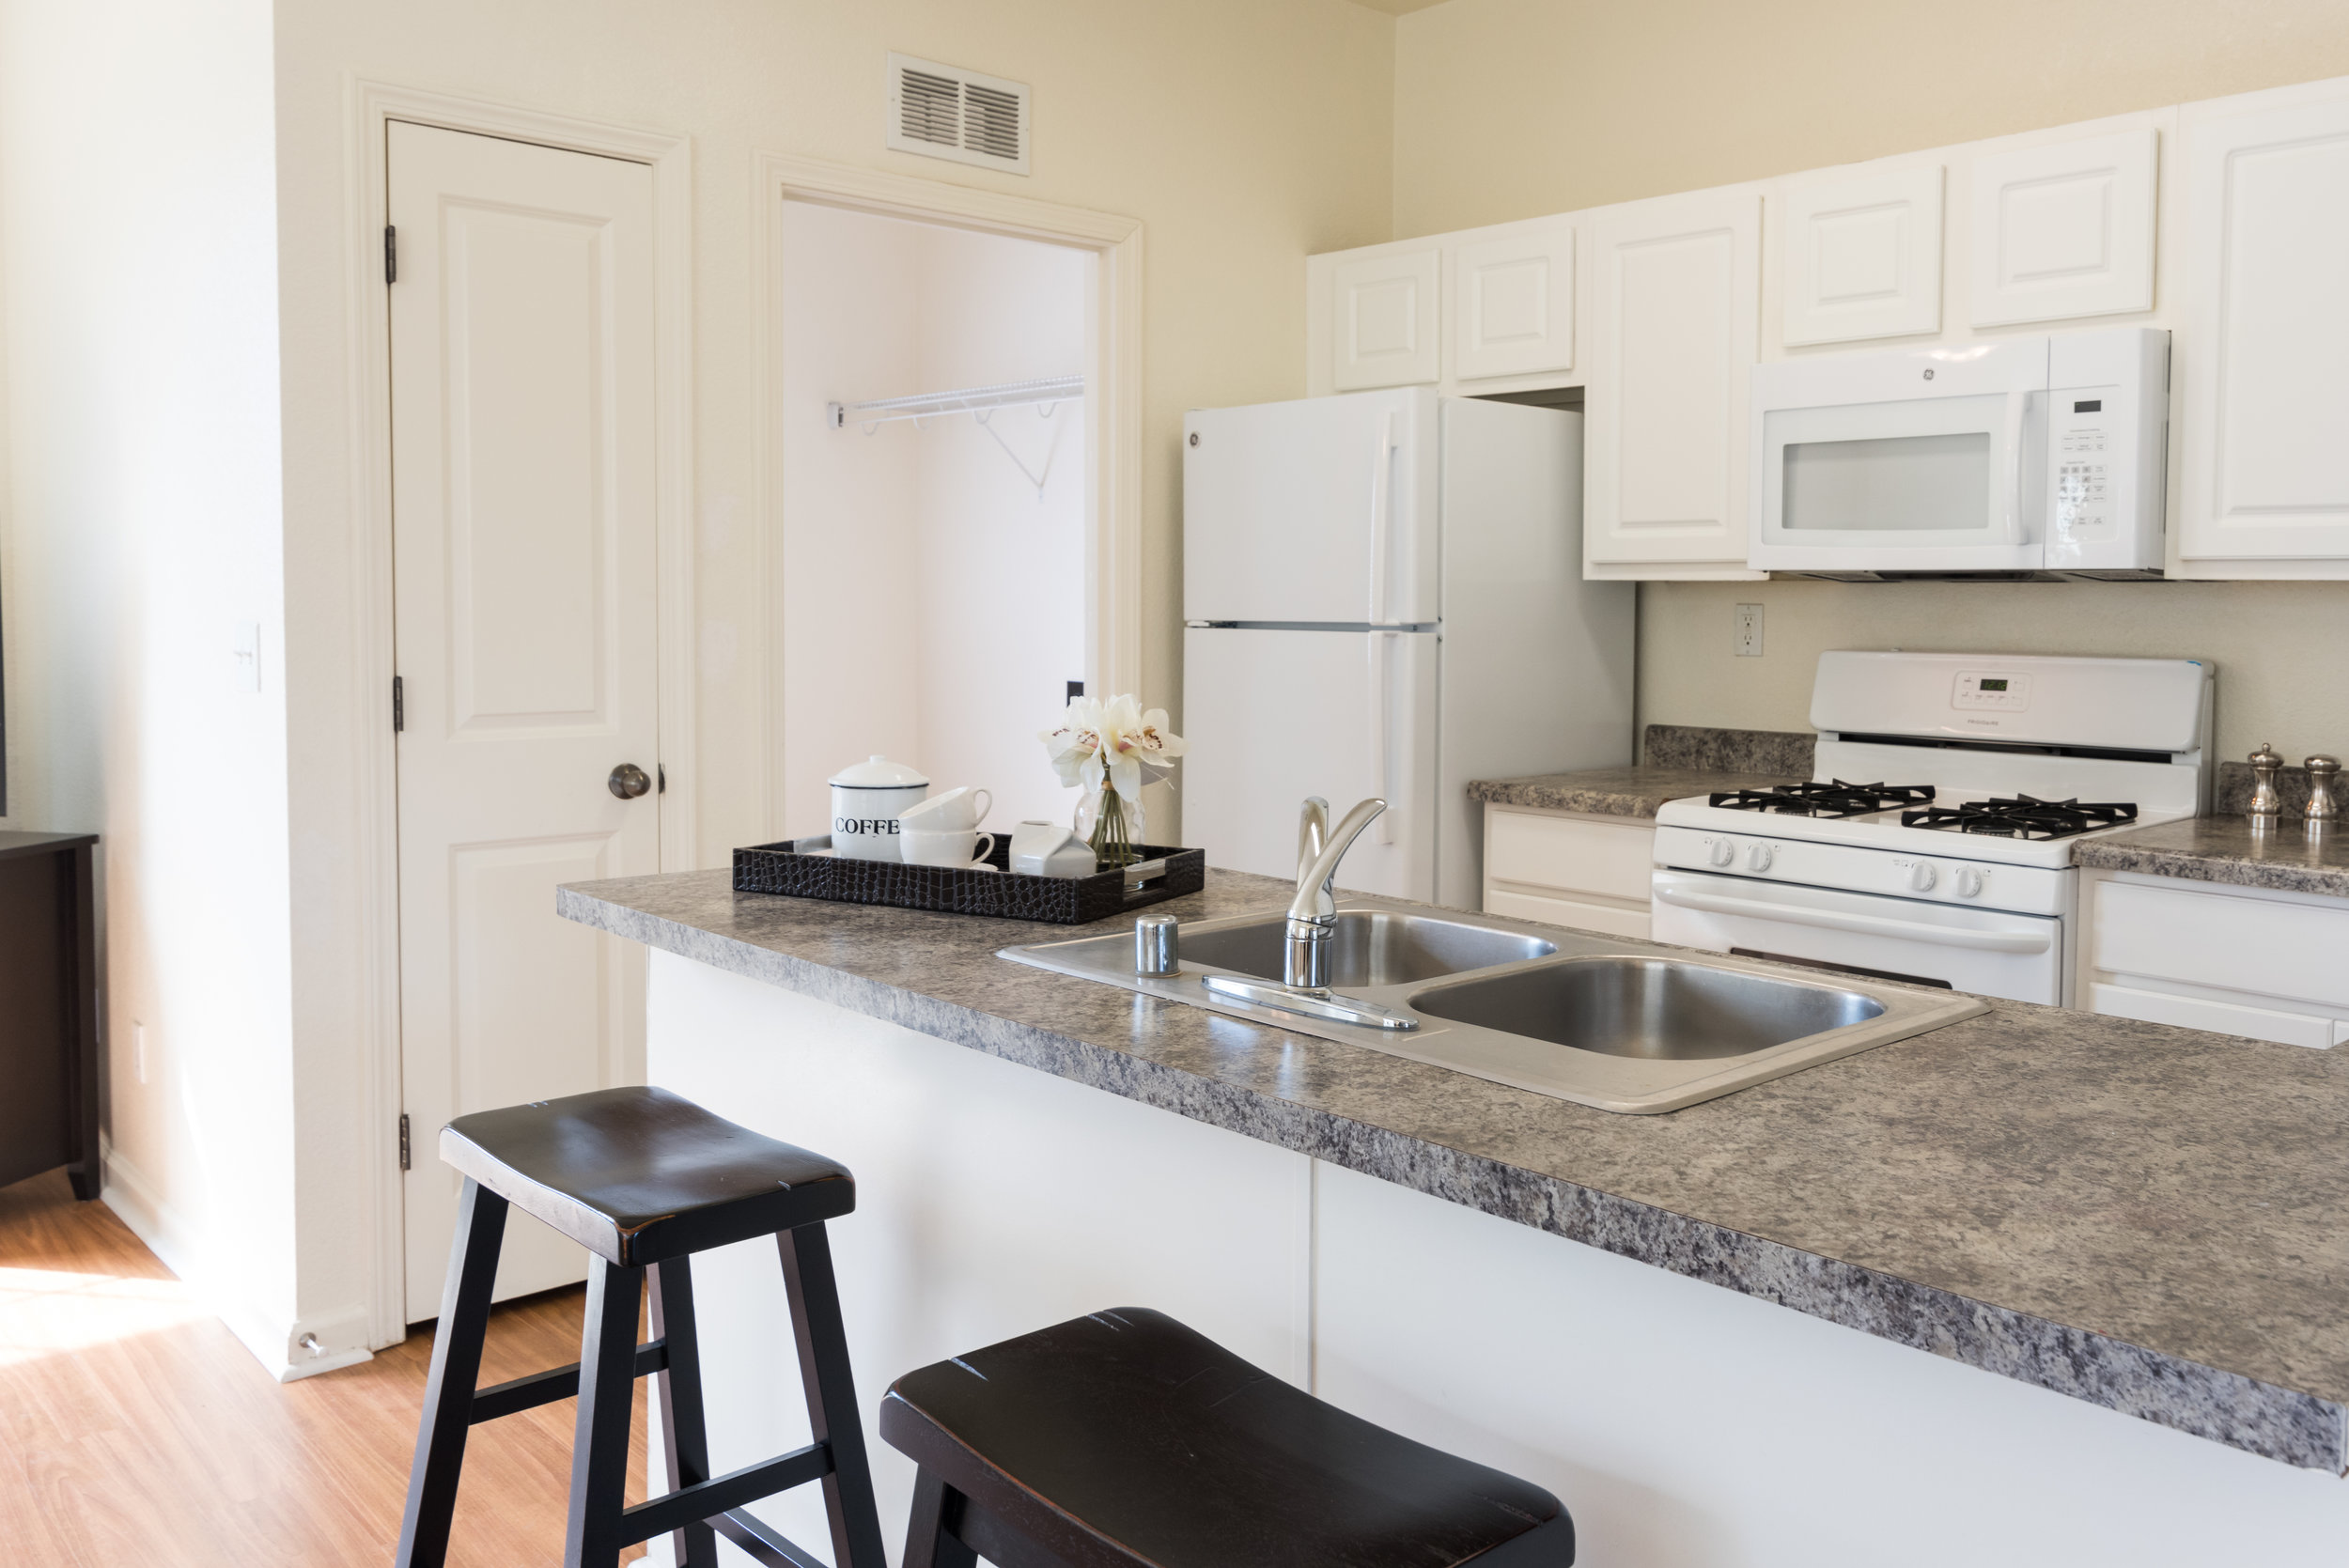 Open Kitchen in Rental Home